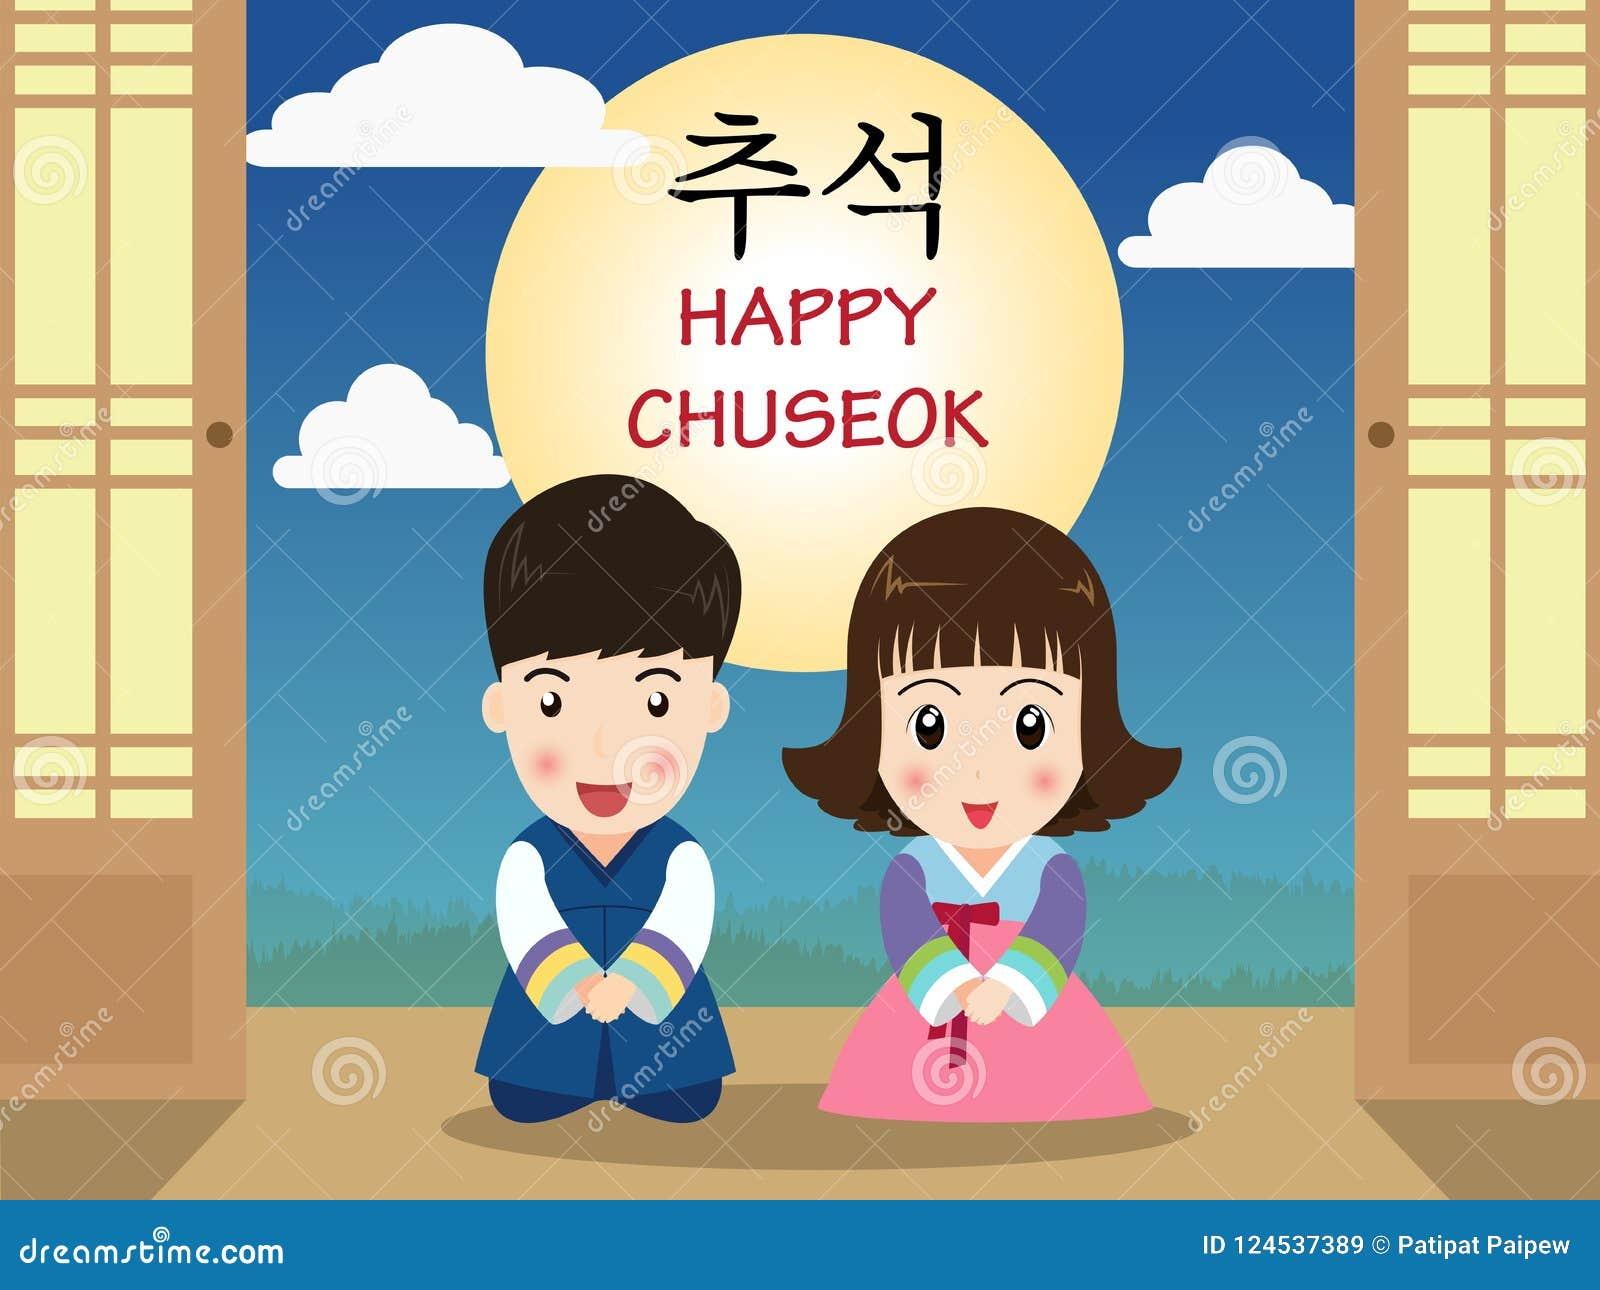 Chuseok Or Hangawi Korean Thanksgiving Day Stock Illustration ...